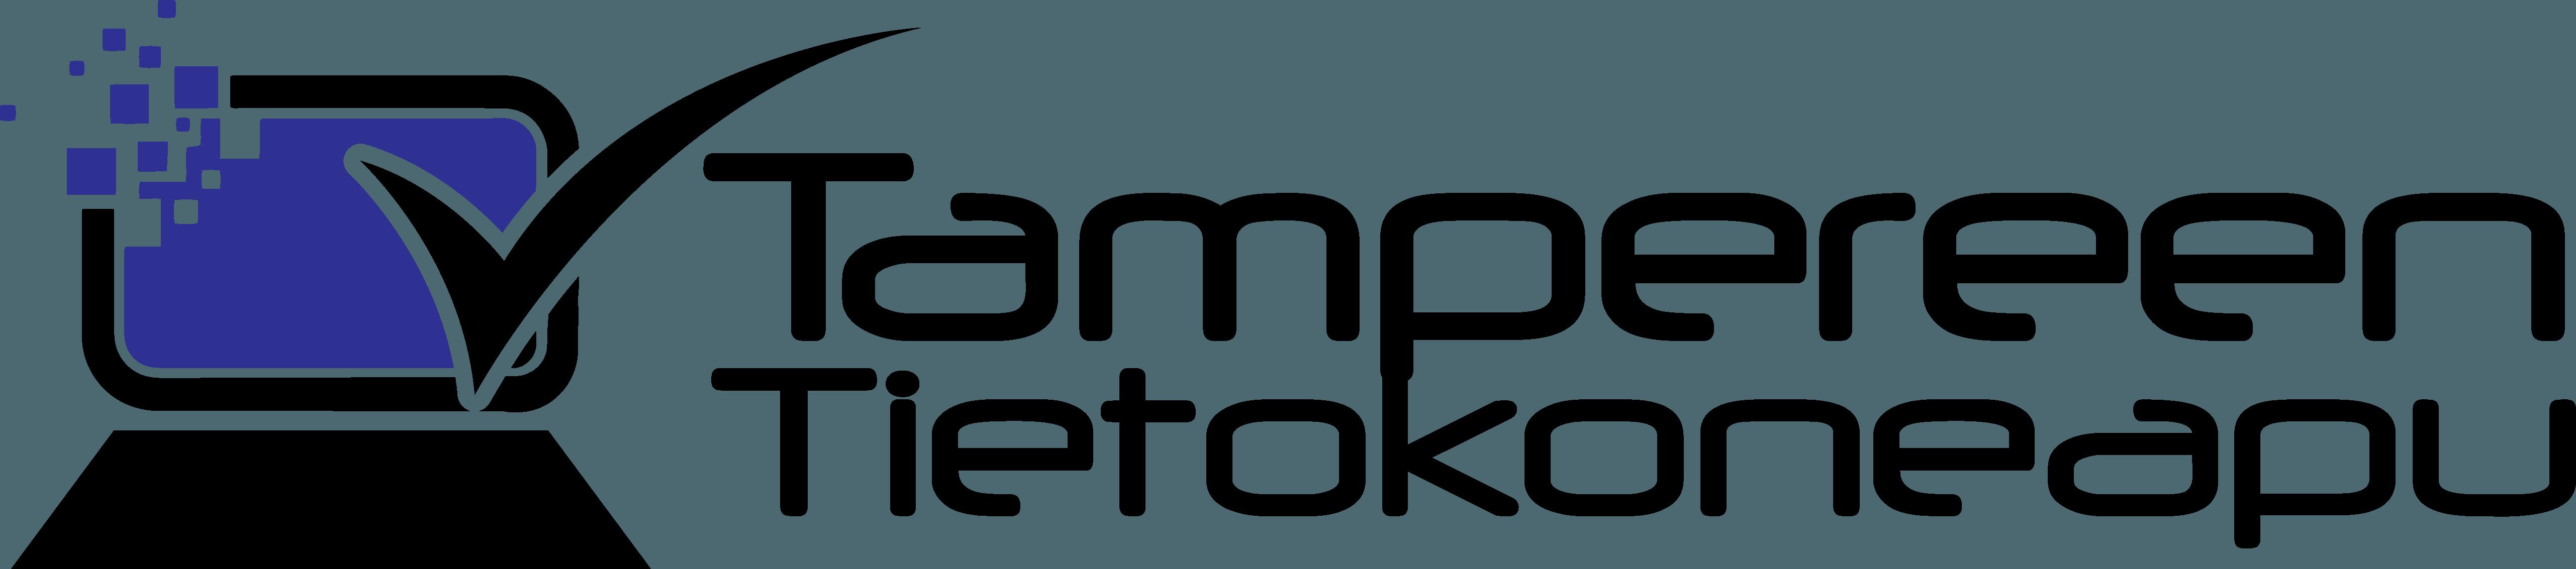 Tampereen Tietokoneapu – Huolto, korjaus ja muu apu